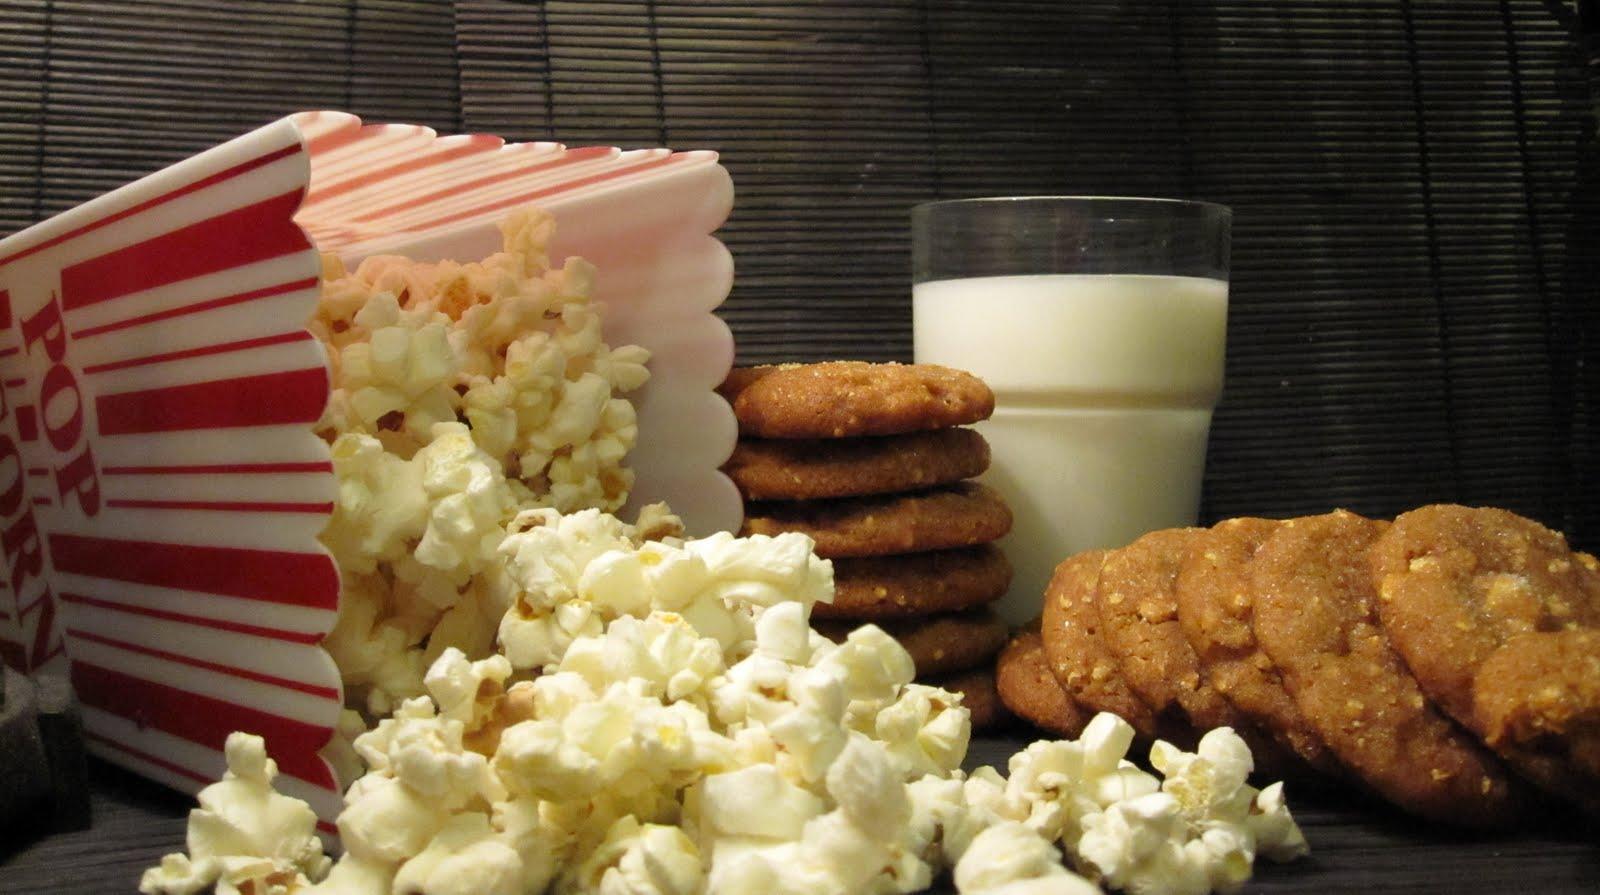 ... popcorn caramel popcorn popcorn ice cream sage popcorn popcorn cookies